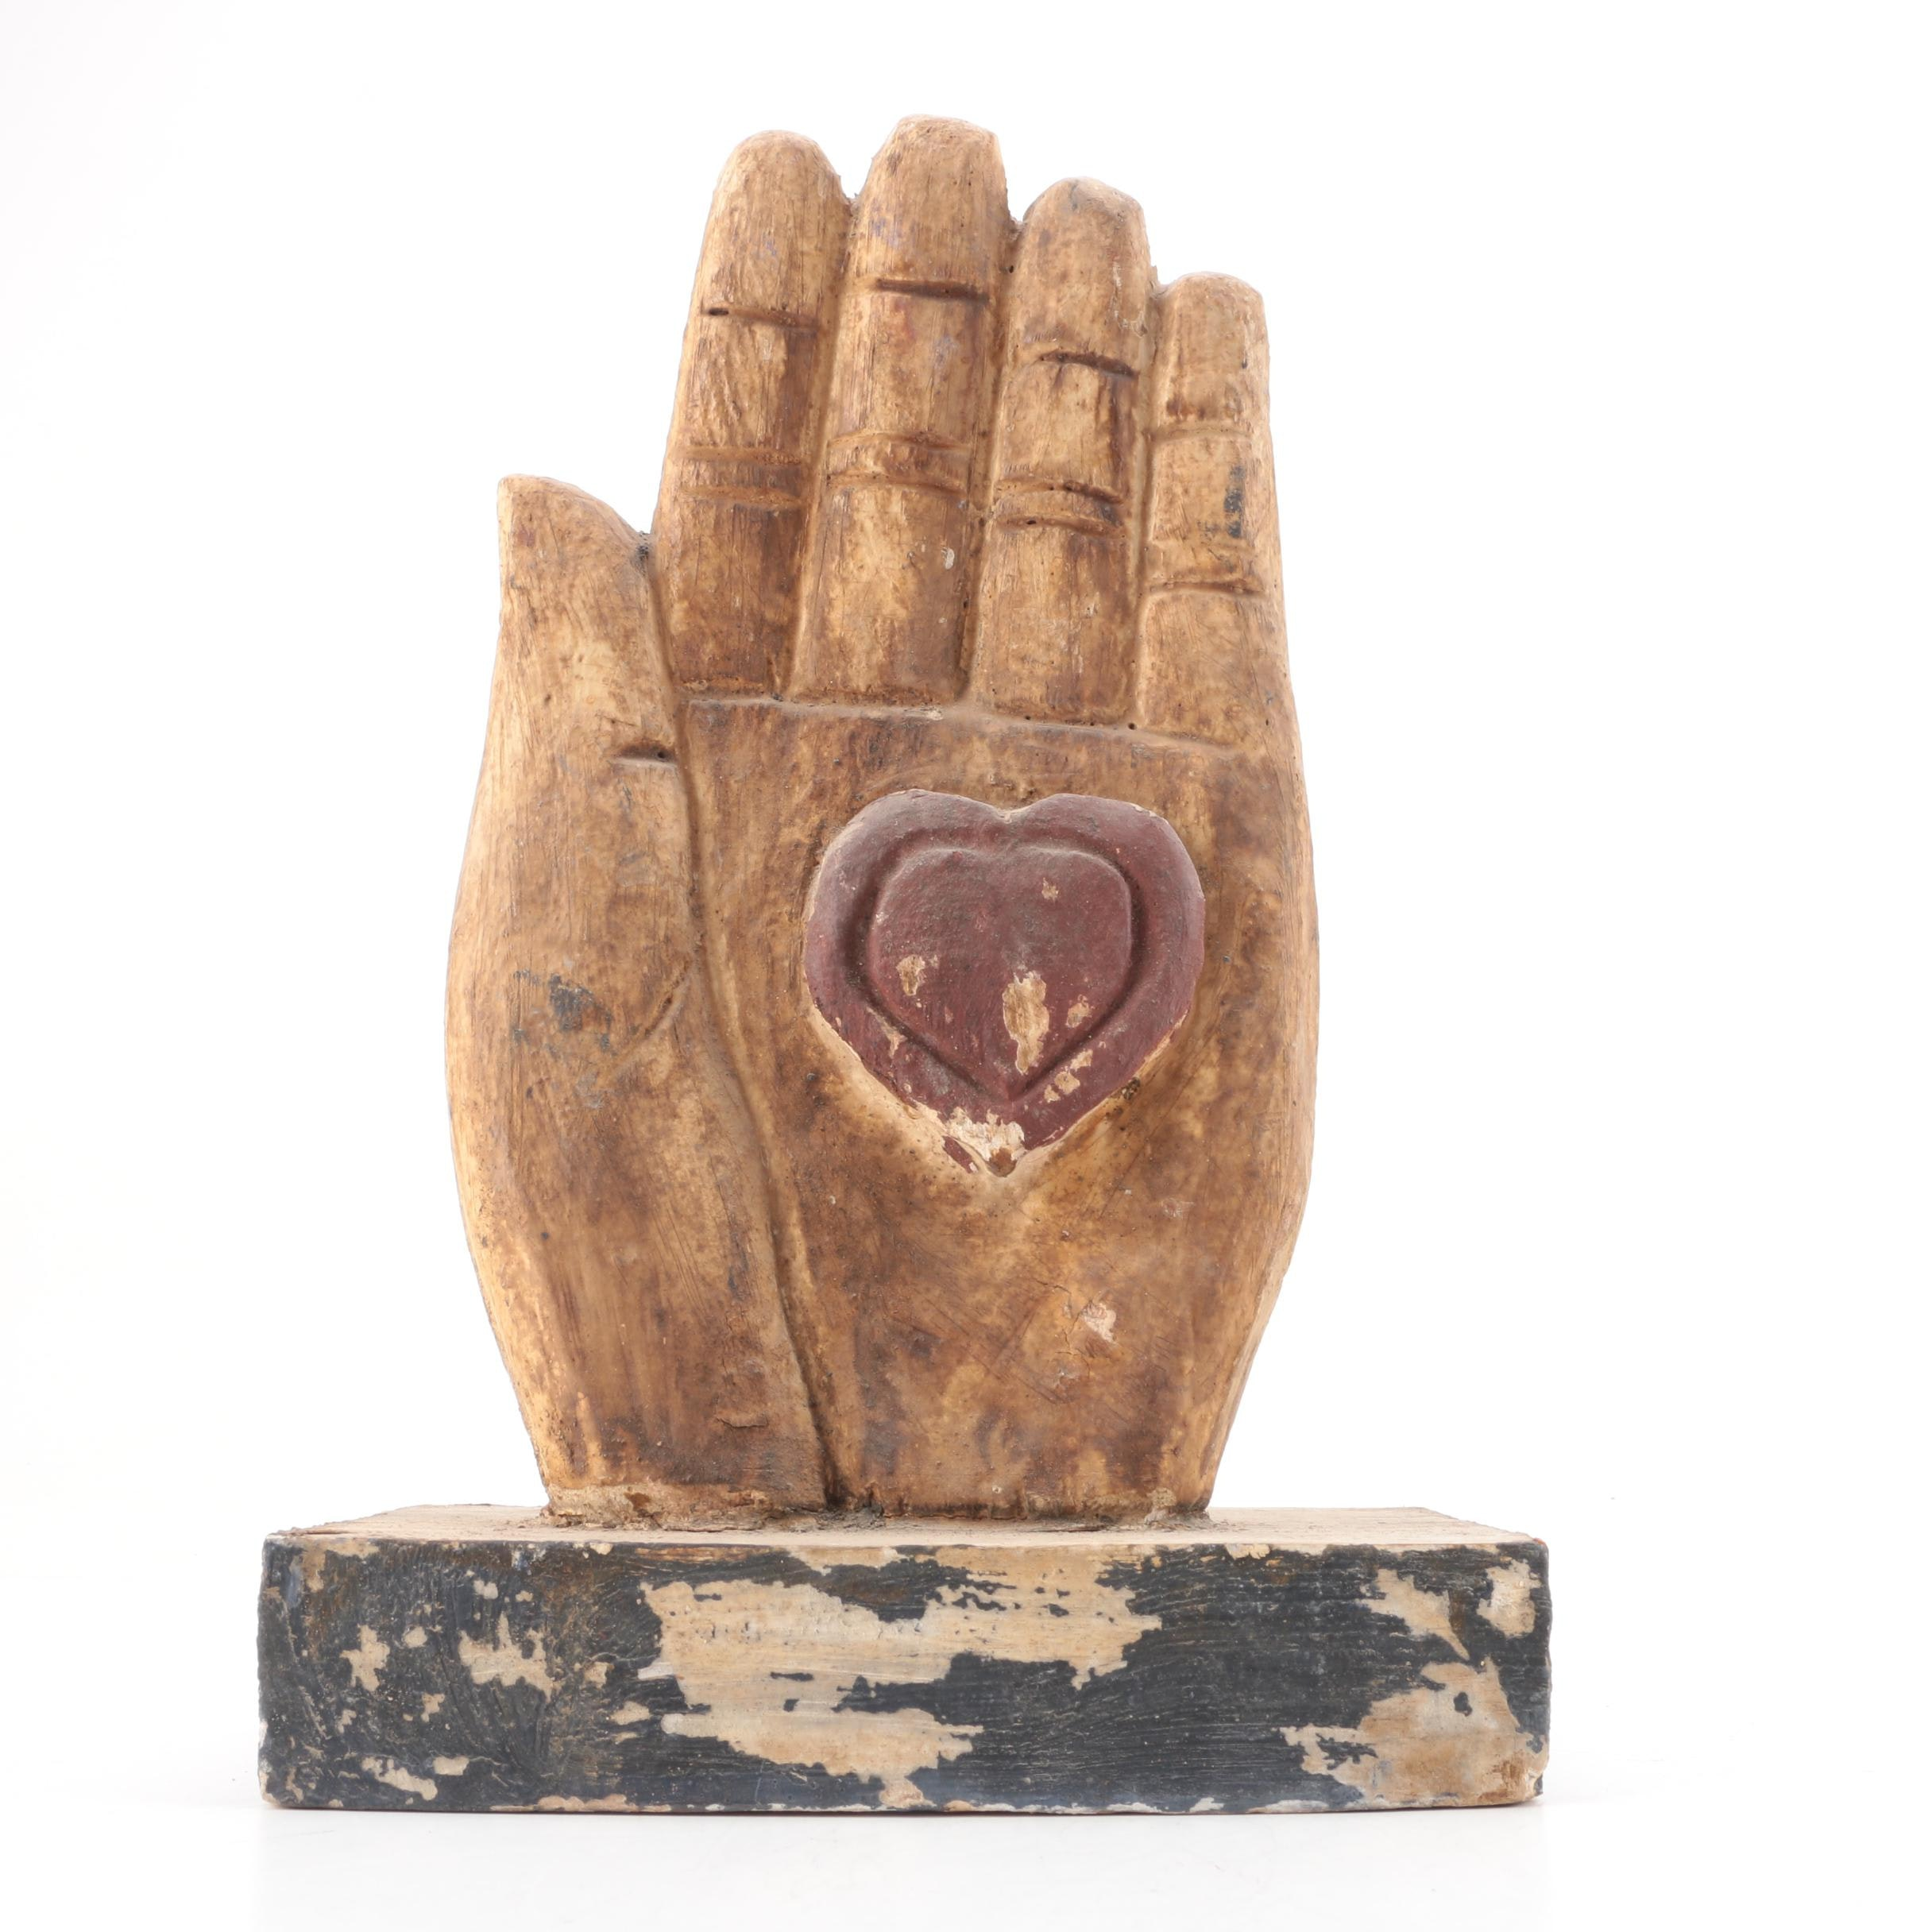 Handcrafted Wooden Heart-In-Hand Sculpture